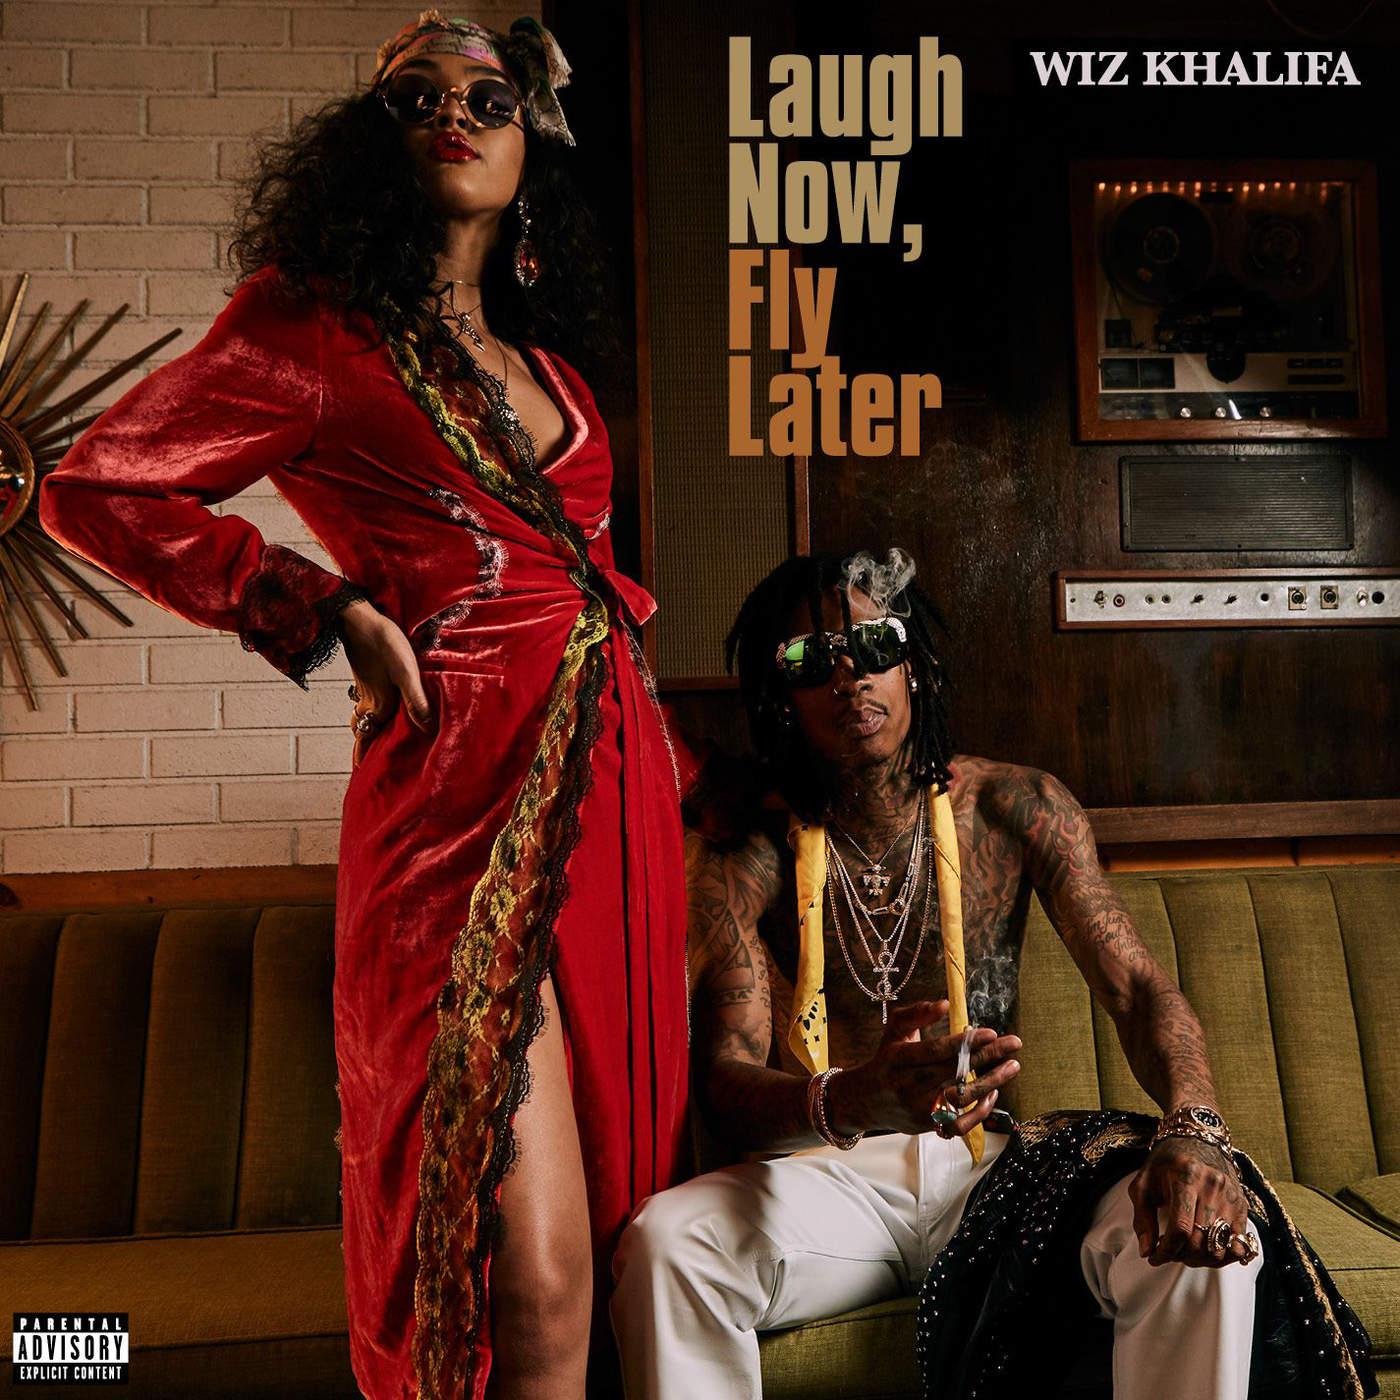 Wiz Khalifa – Laugh Now, Fly Later [Mixtape]